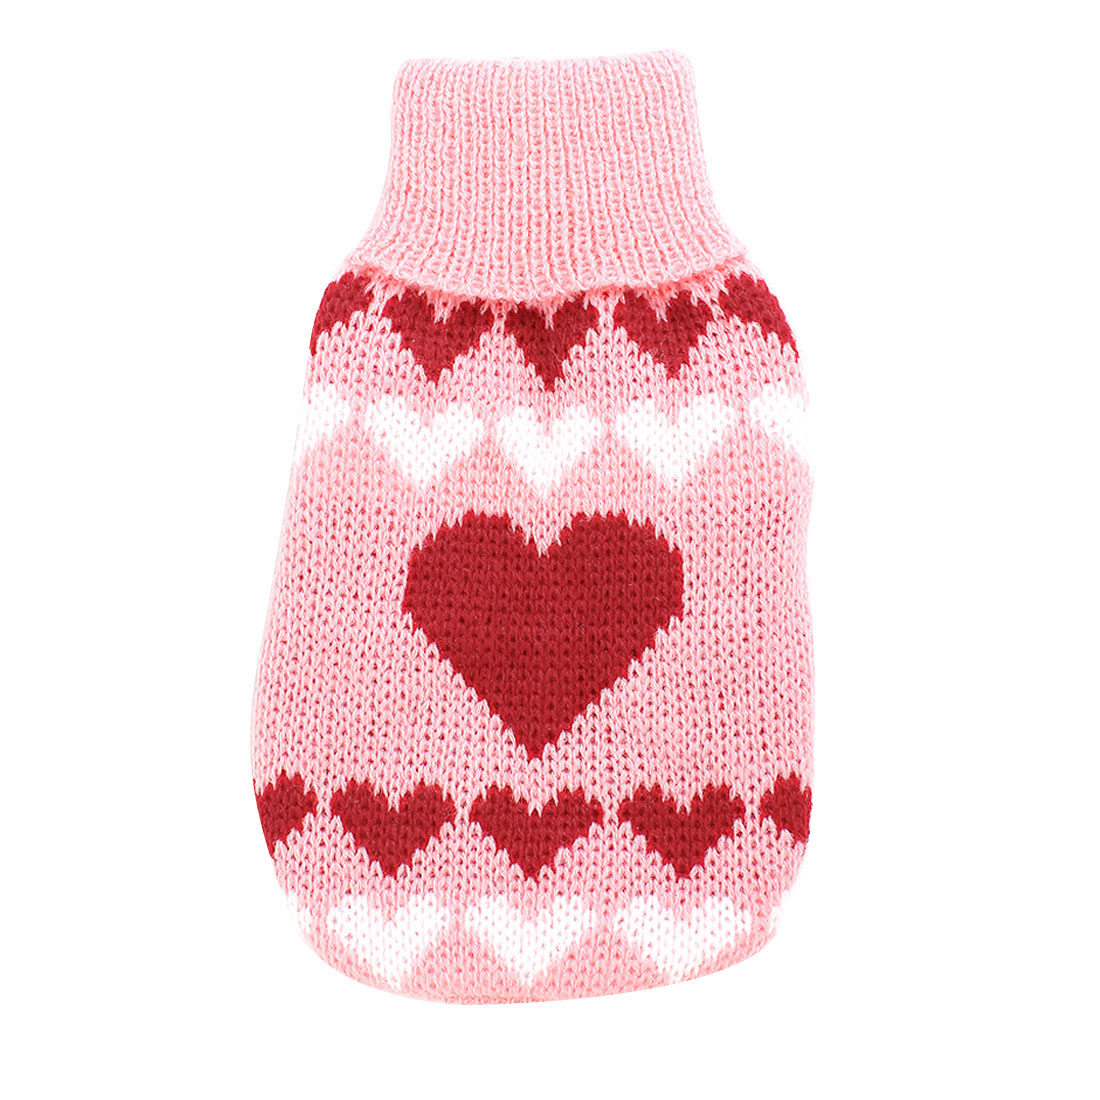 Unique Bargains Winter Turtleneck Heart Print Pet Dog Doggie Apparel Sweater Pink Red XXS